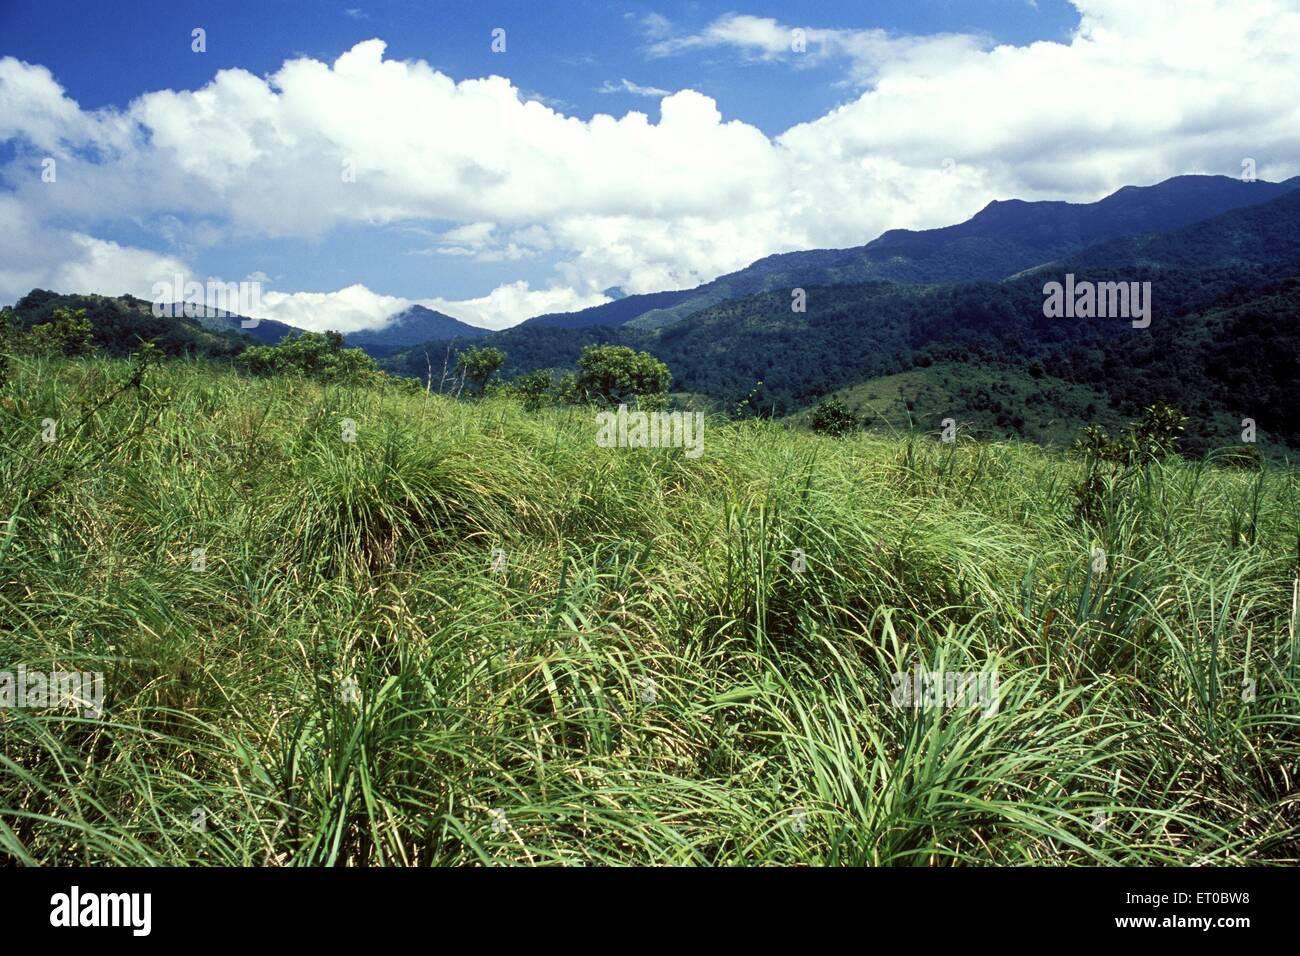 Silent Valley National Park ; il Kerala foresta pluviale tropicale ; India Immagini Stock